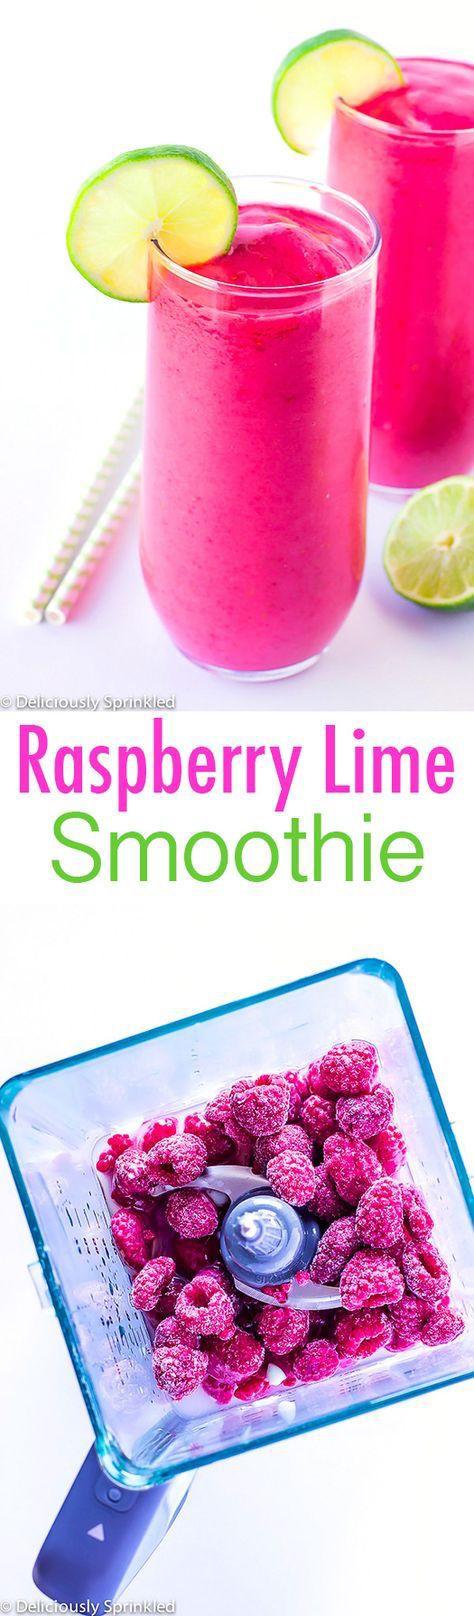 Raspberry Lime Smoothie - easy DIY smoothie recipe!